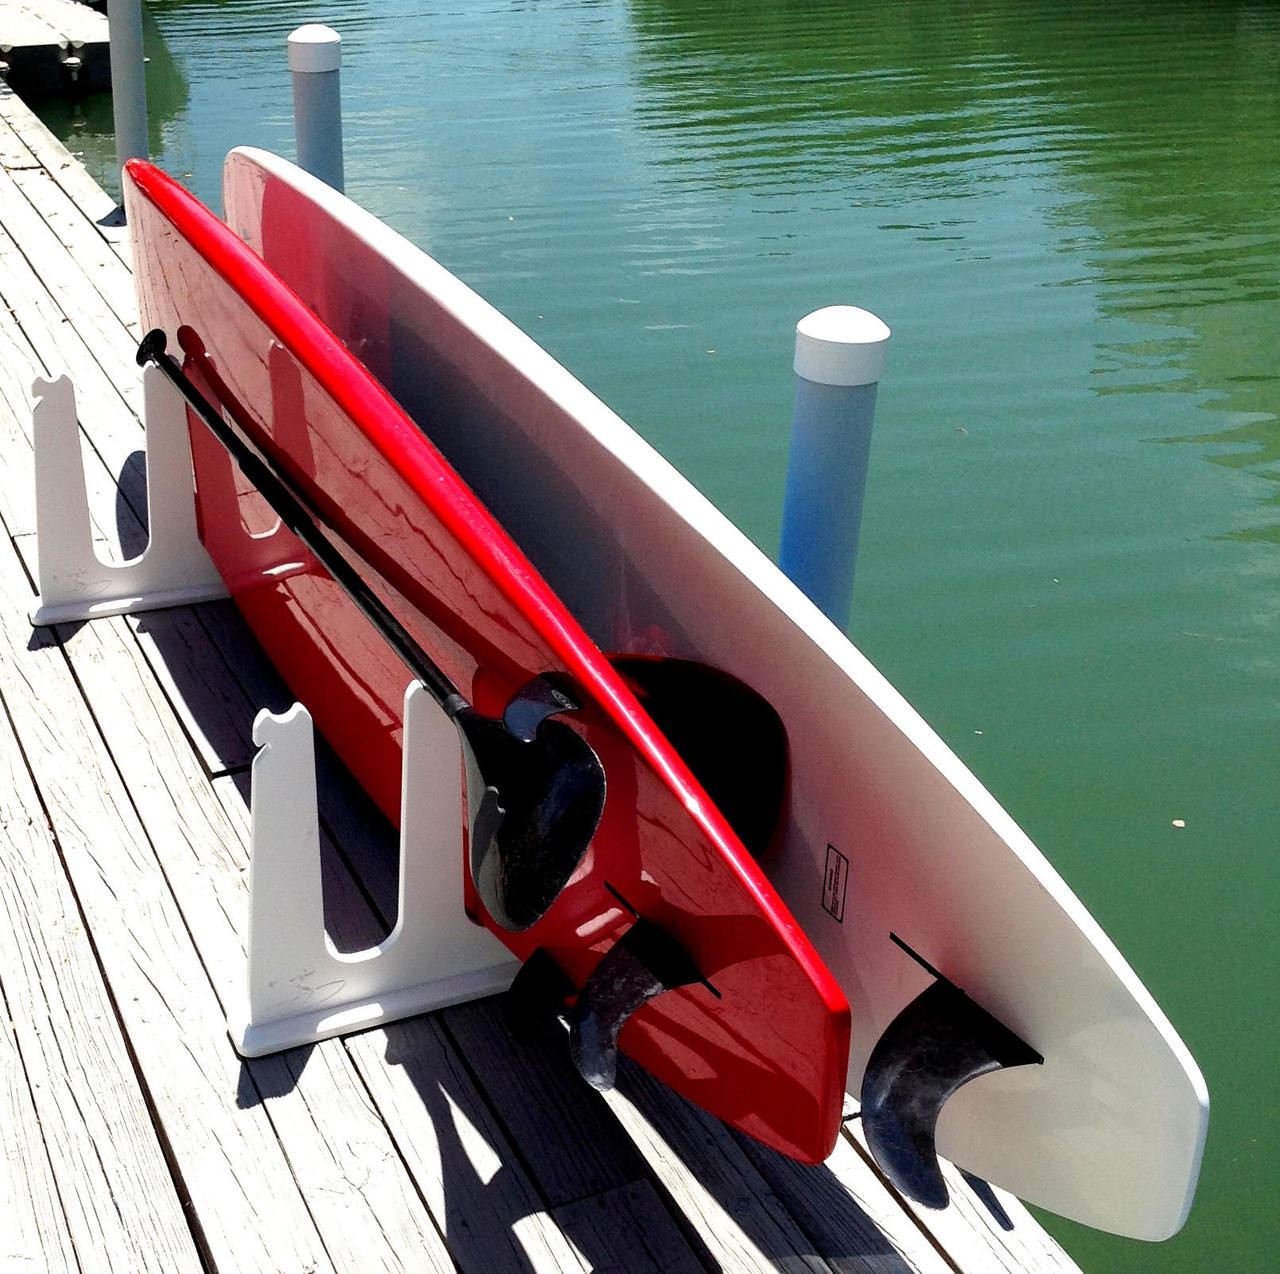 Paddle Board Rack >> Surfboard Rack For Docks And Piers Marine Grade Storeyourboard Com